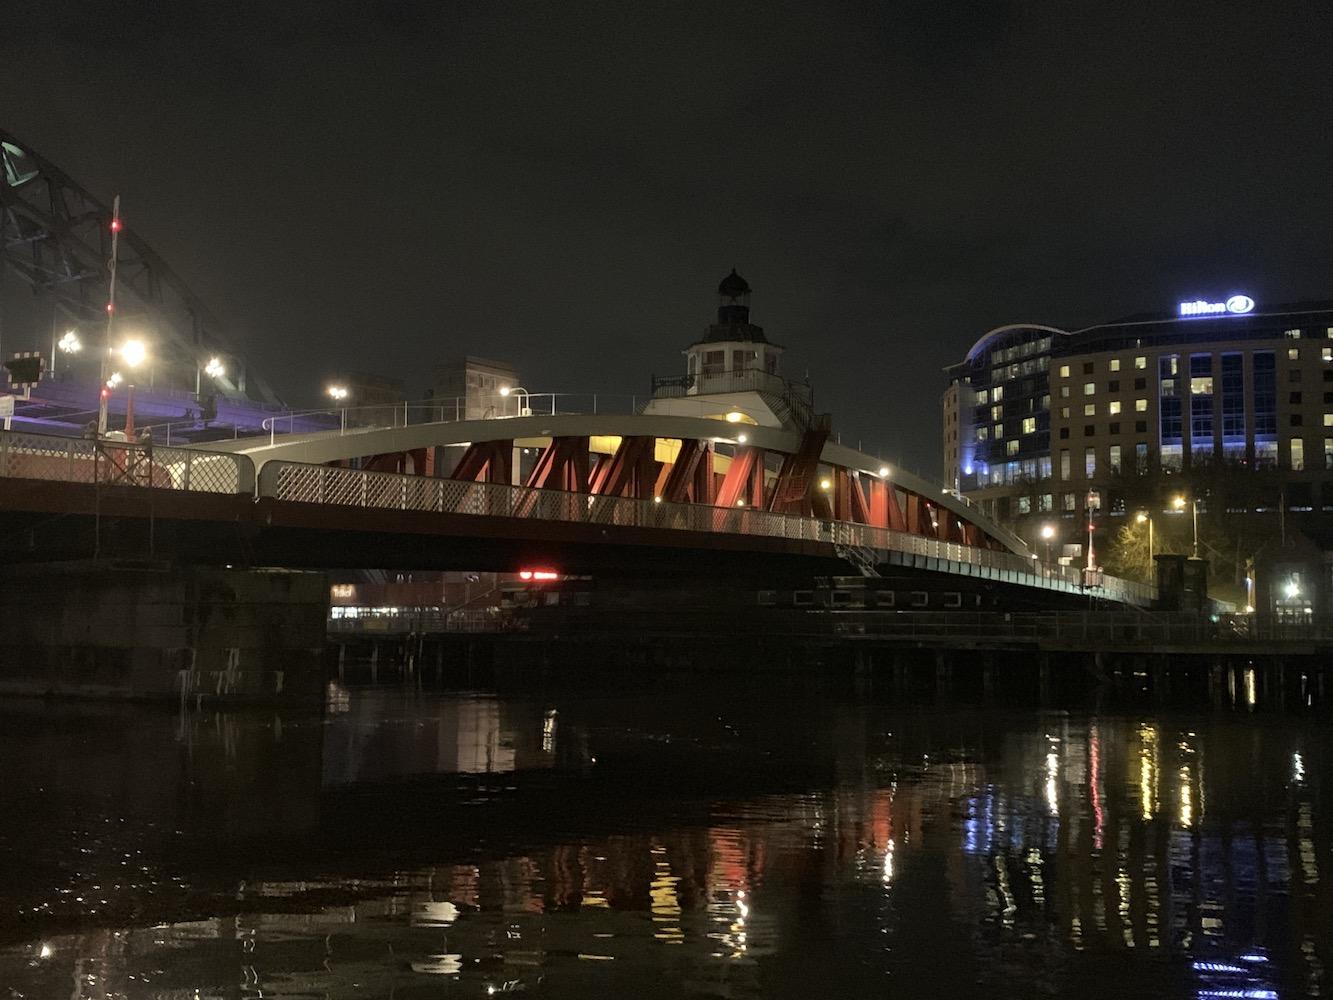 Tyne Swing Bridge